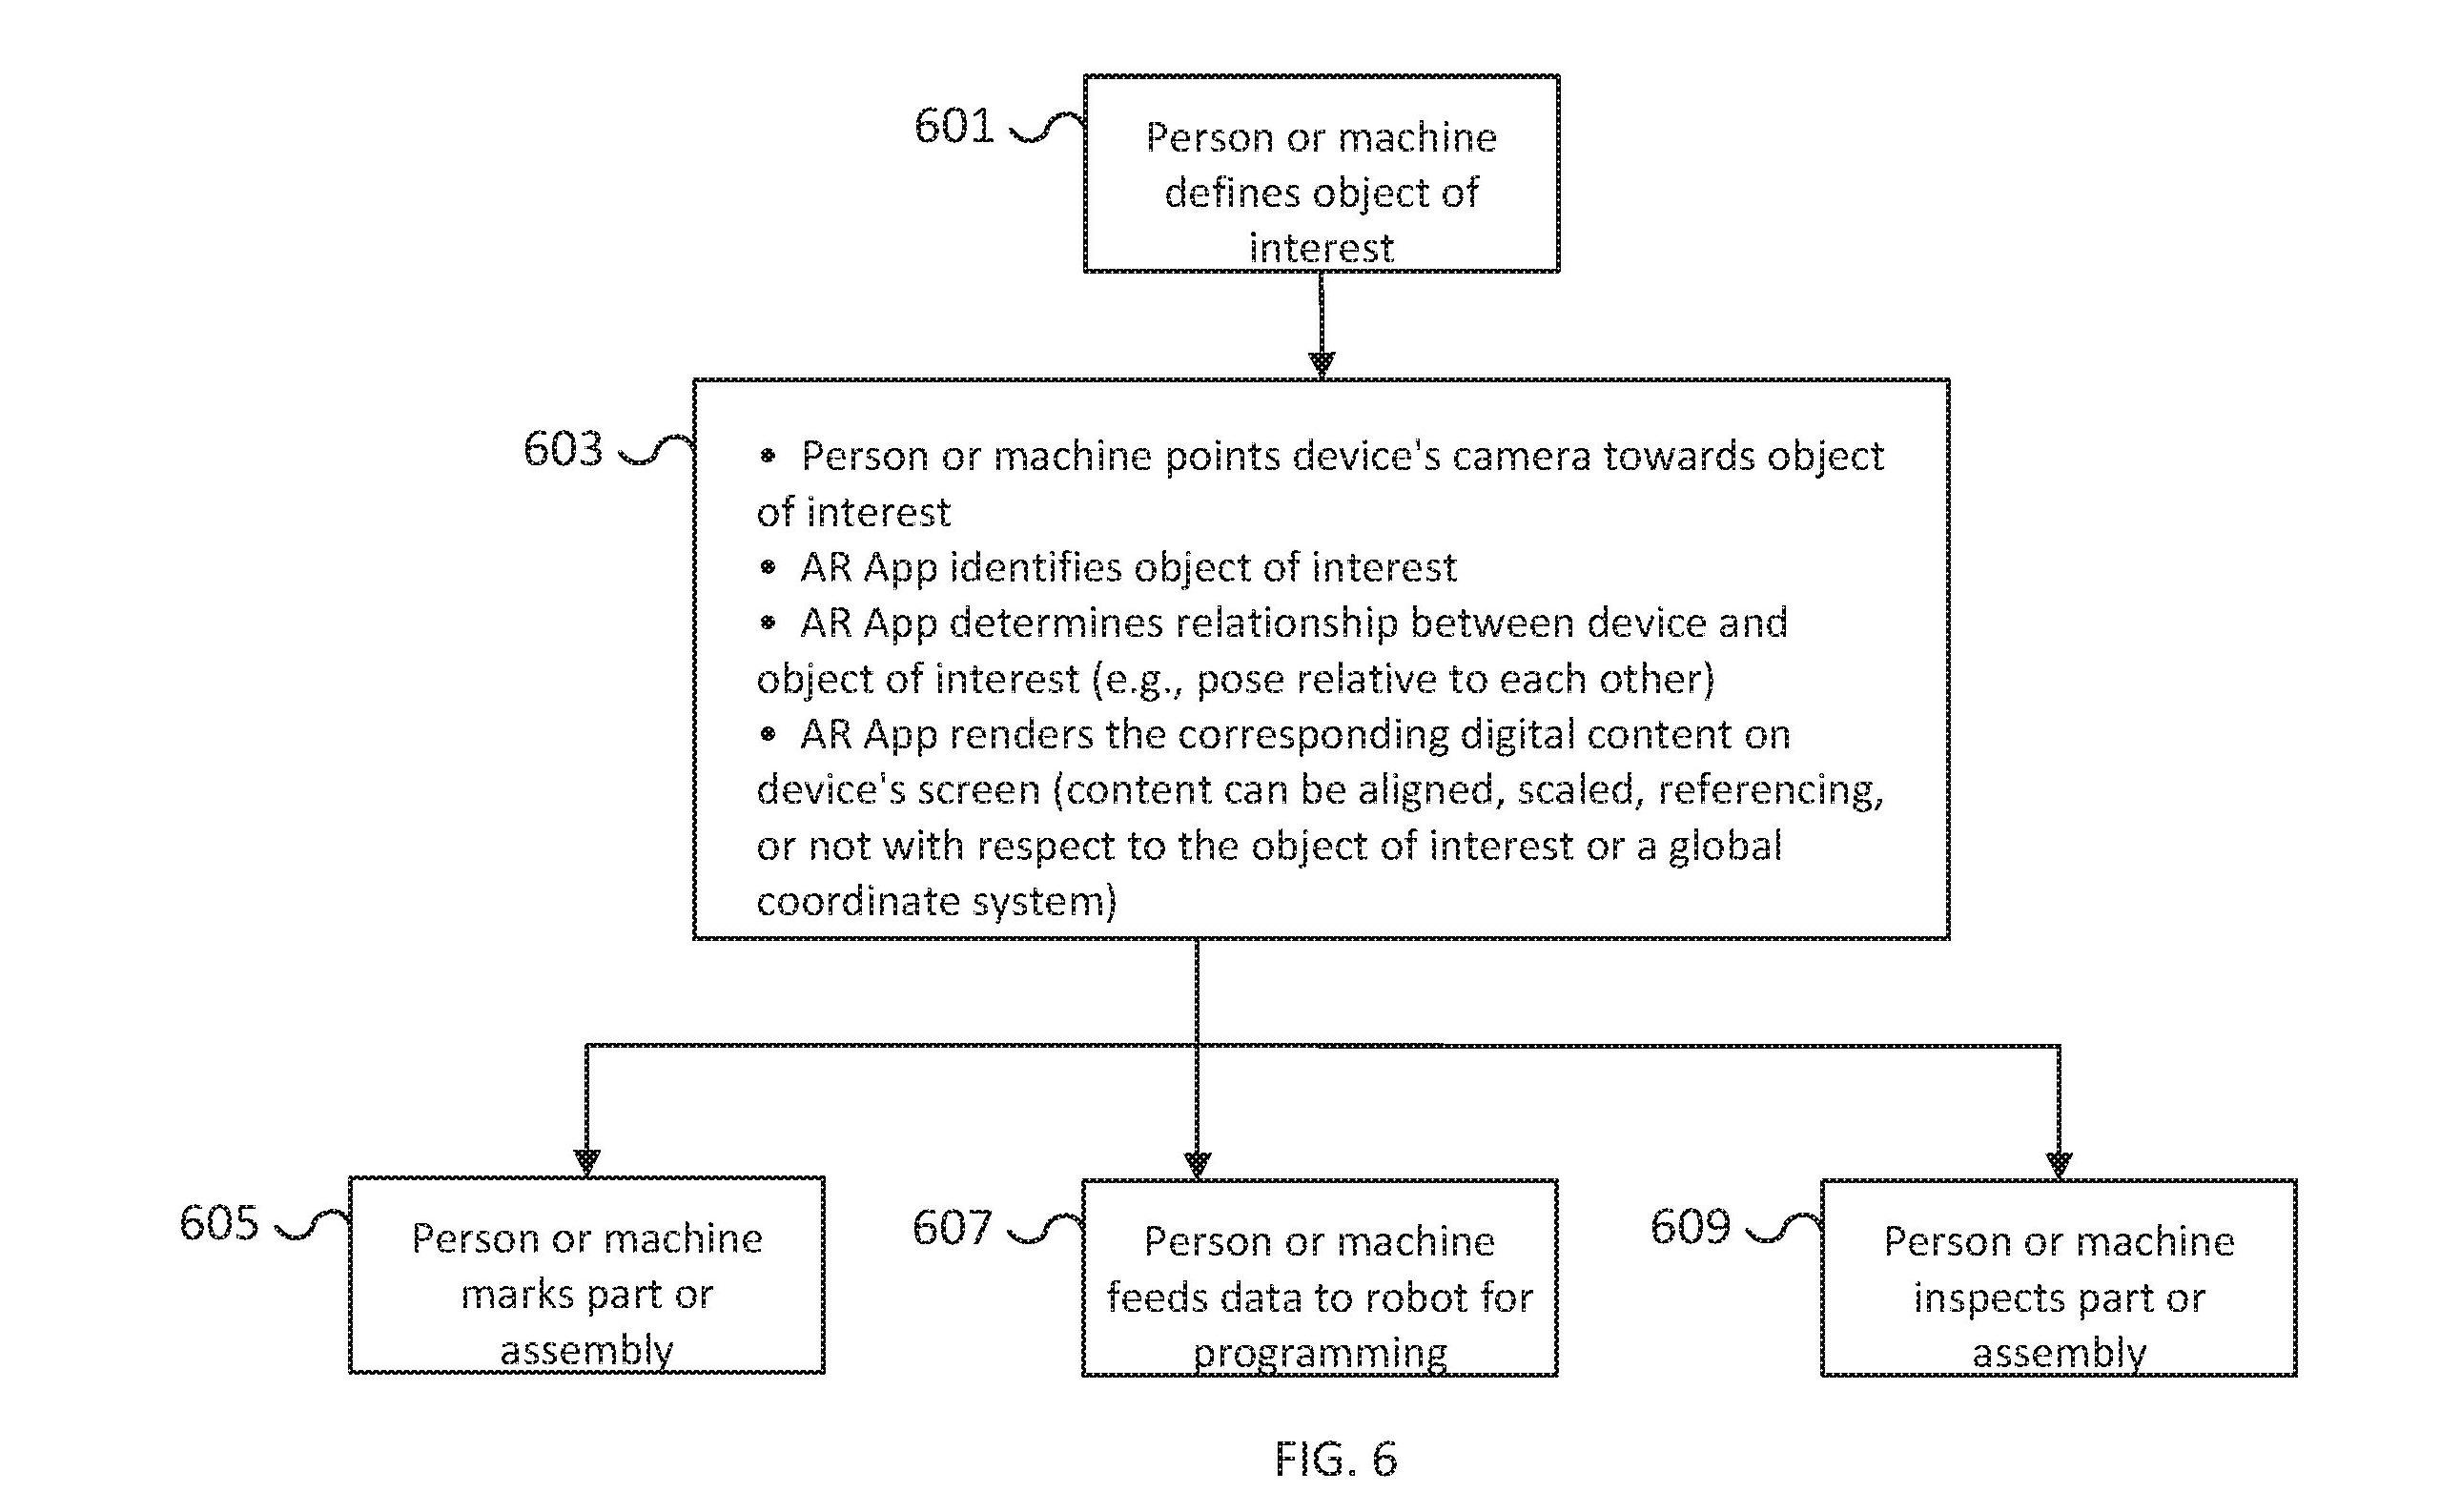 tesla-ar-patent-1